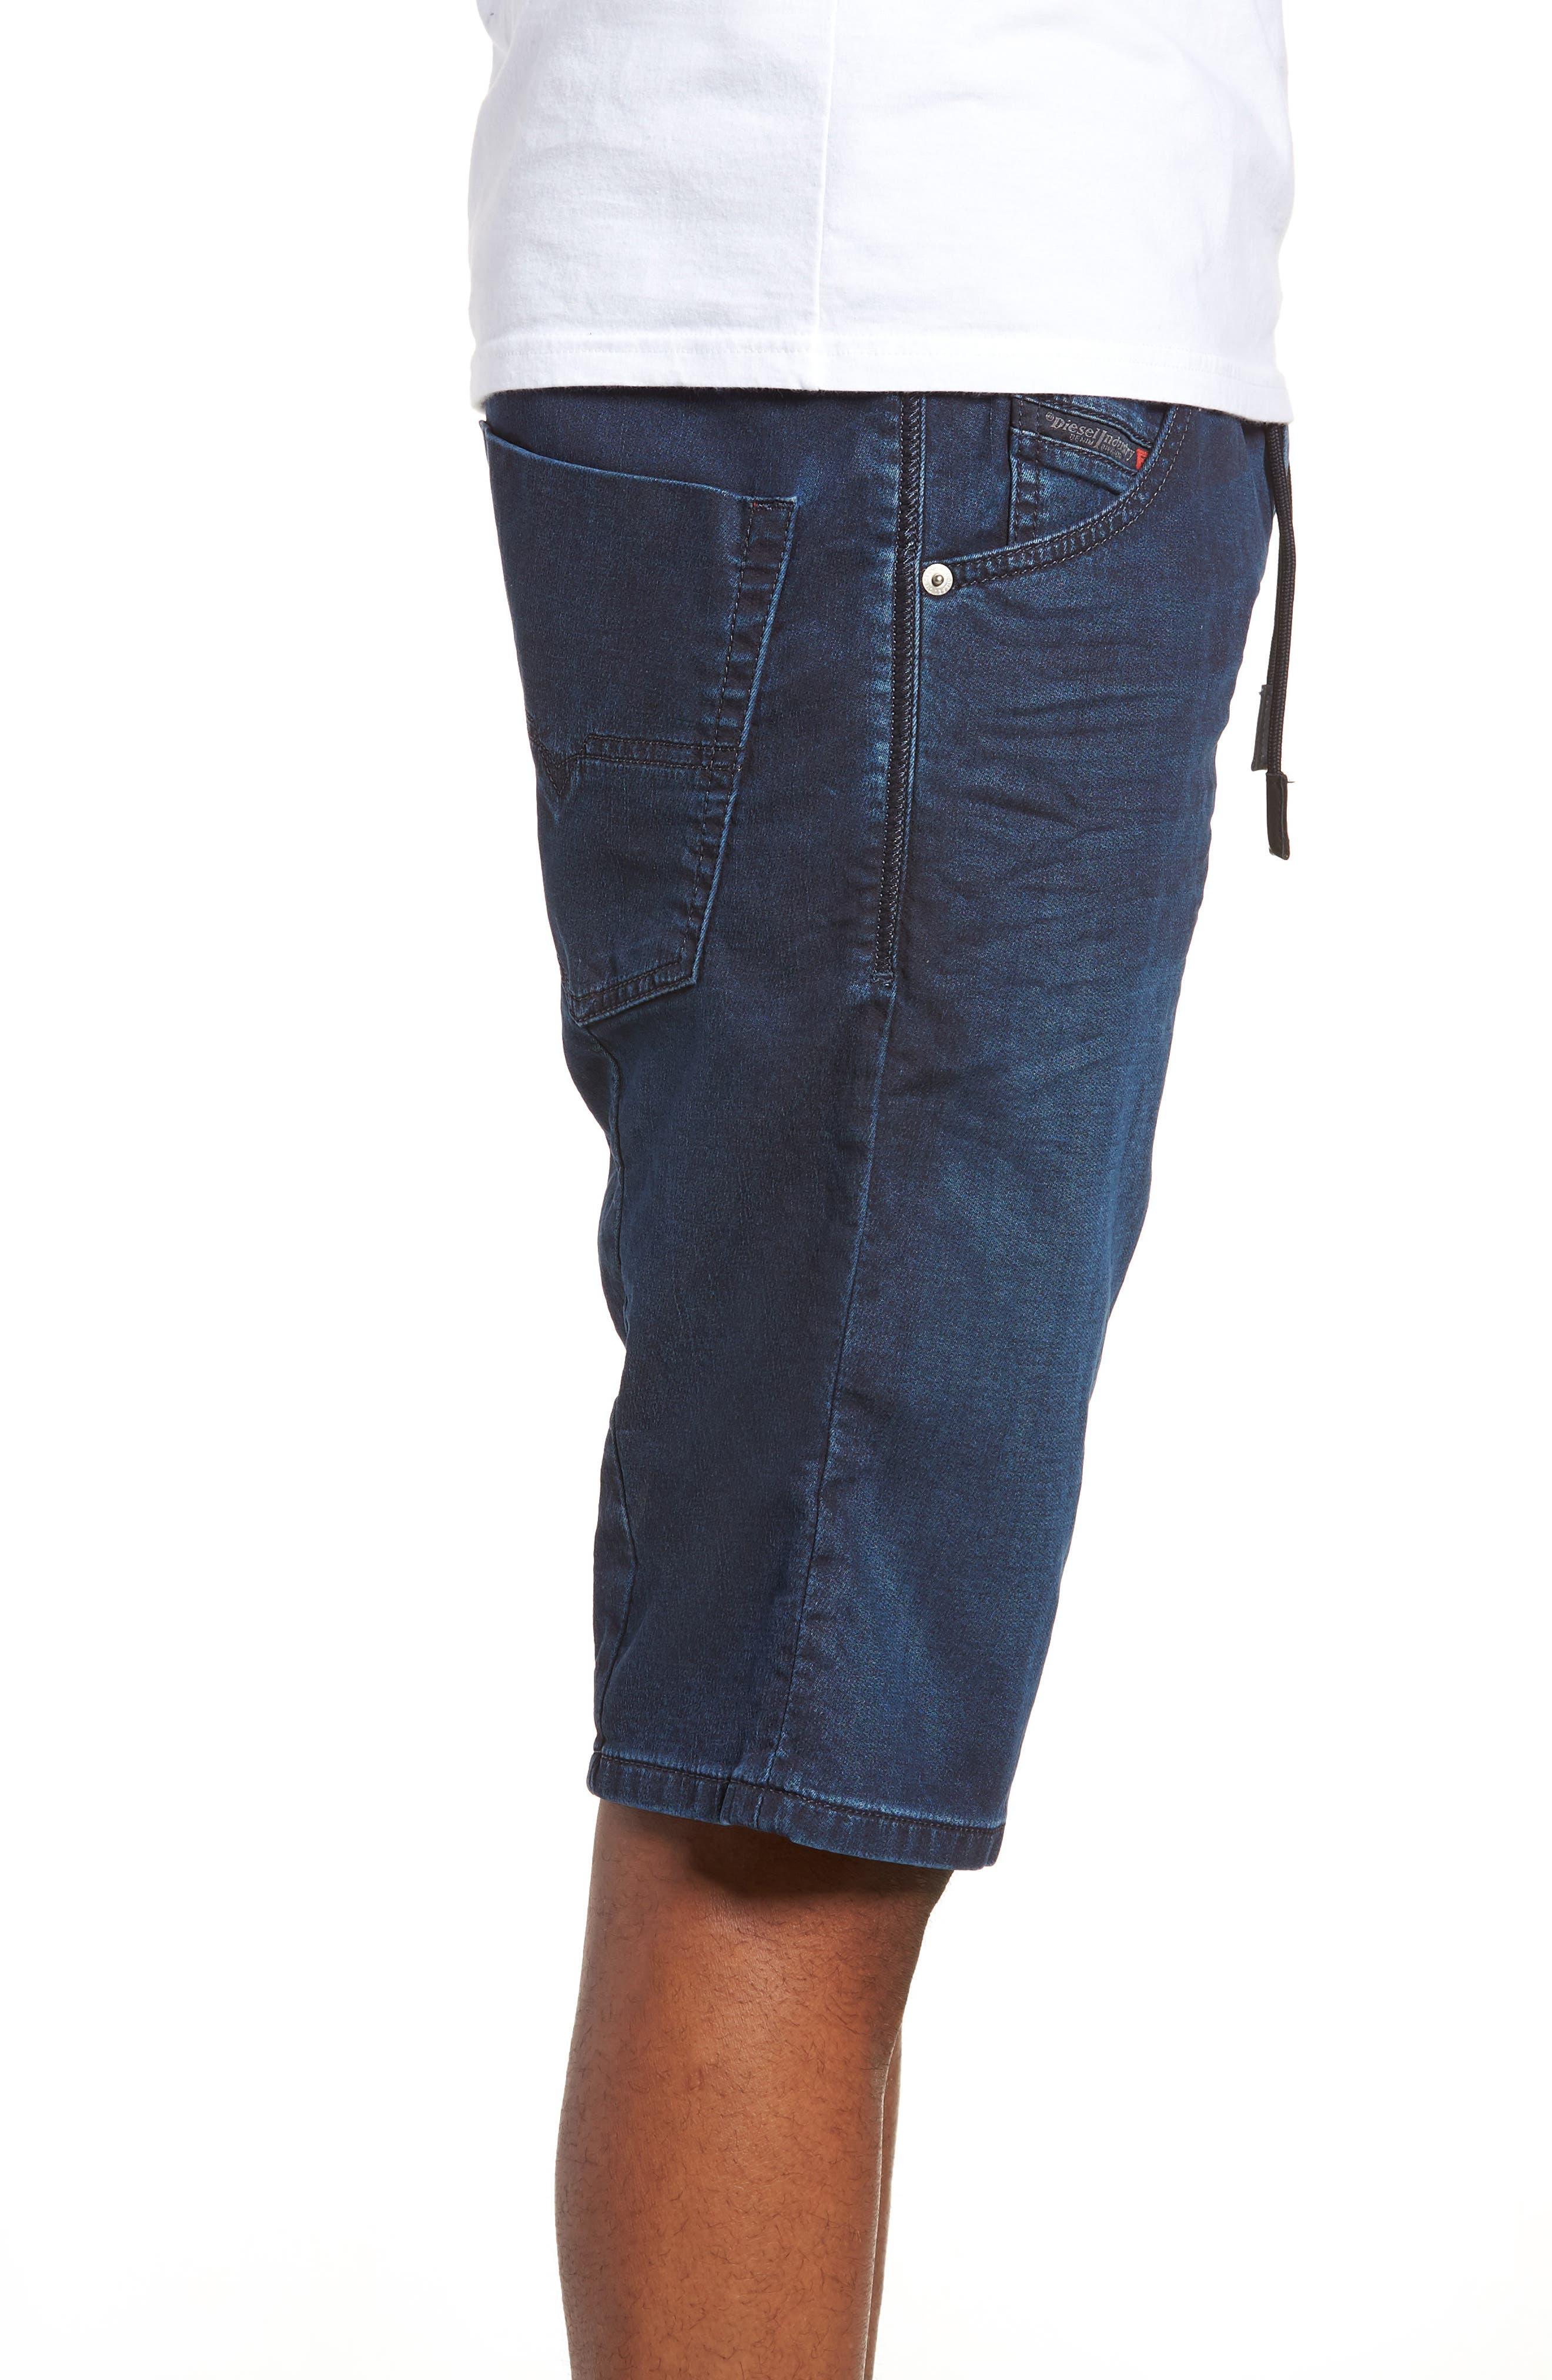 Krooshort Denim Shorts,                             Alternate thumbnail 3, color,                             0699C